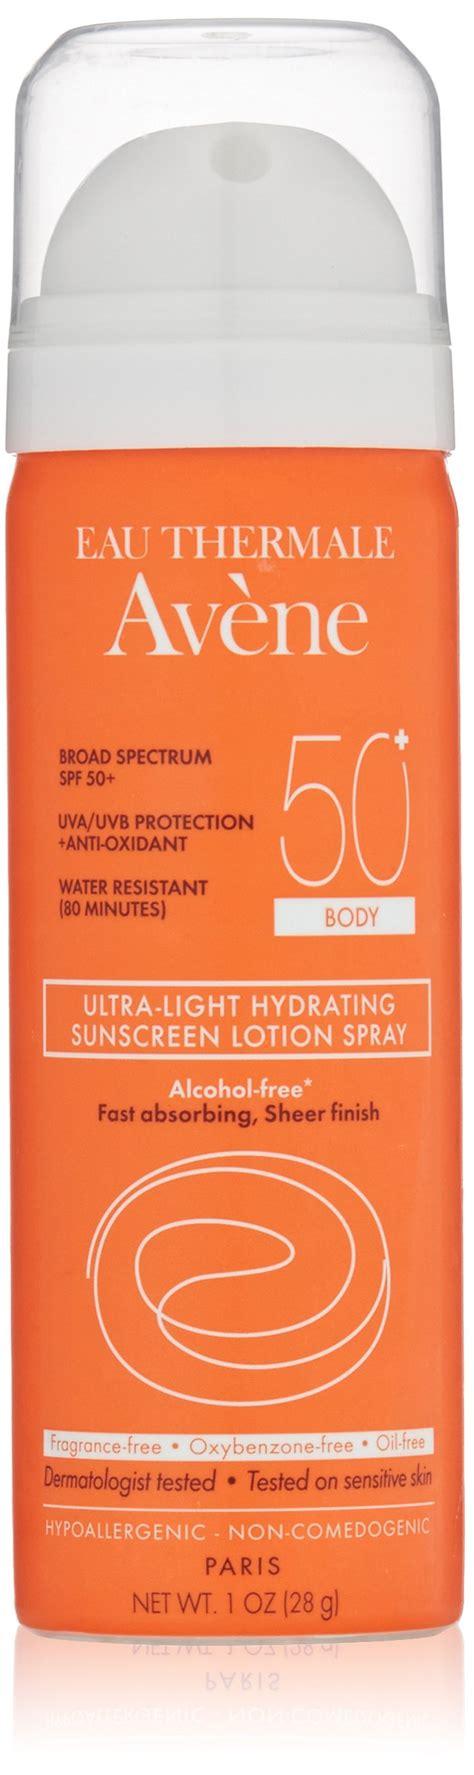 avene eau thermale ultra light hydrating sunscreen lotion eau thermale av 232 ne ultra light spf 50 plus hydrating